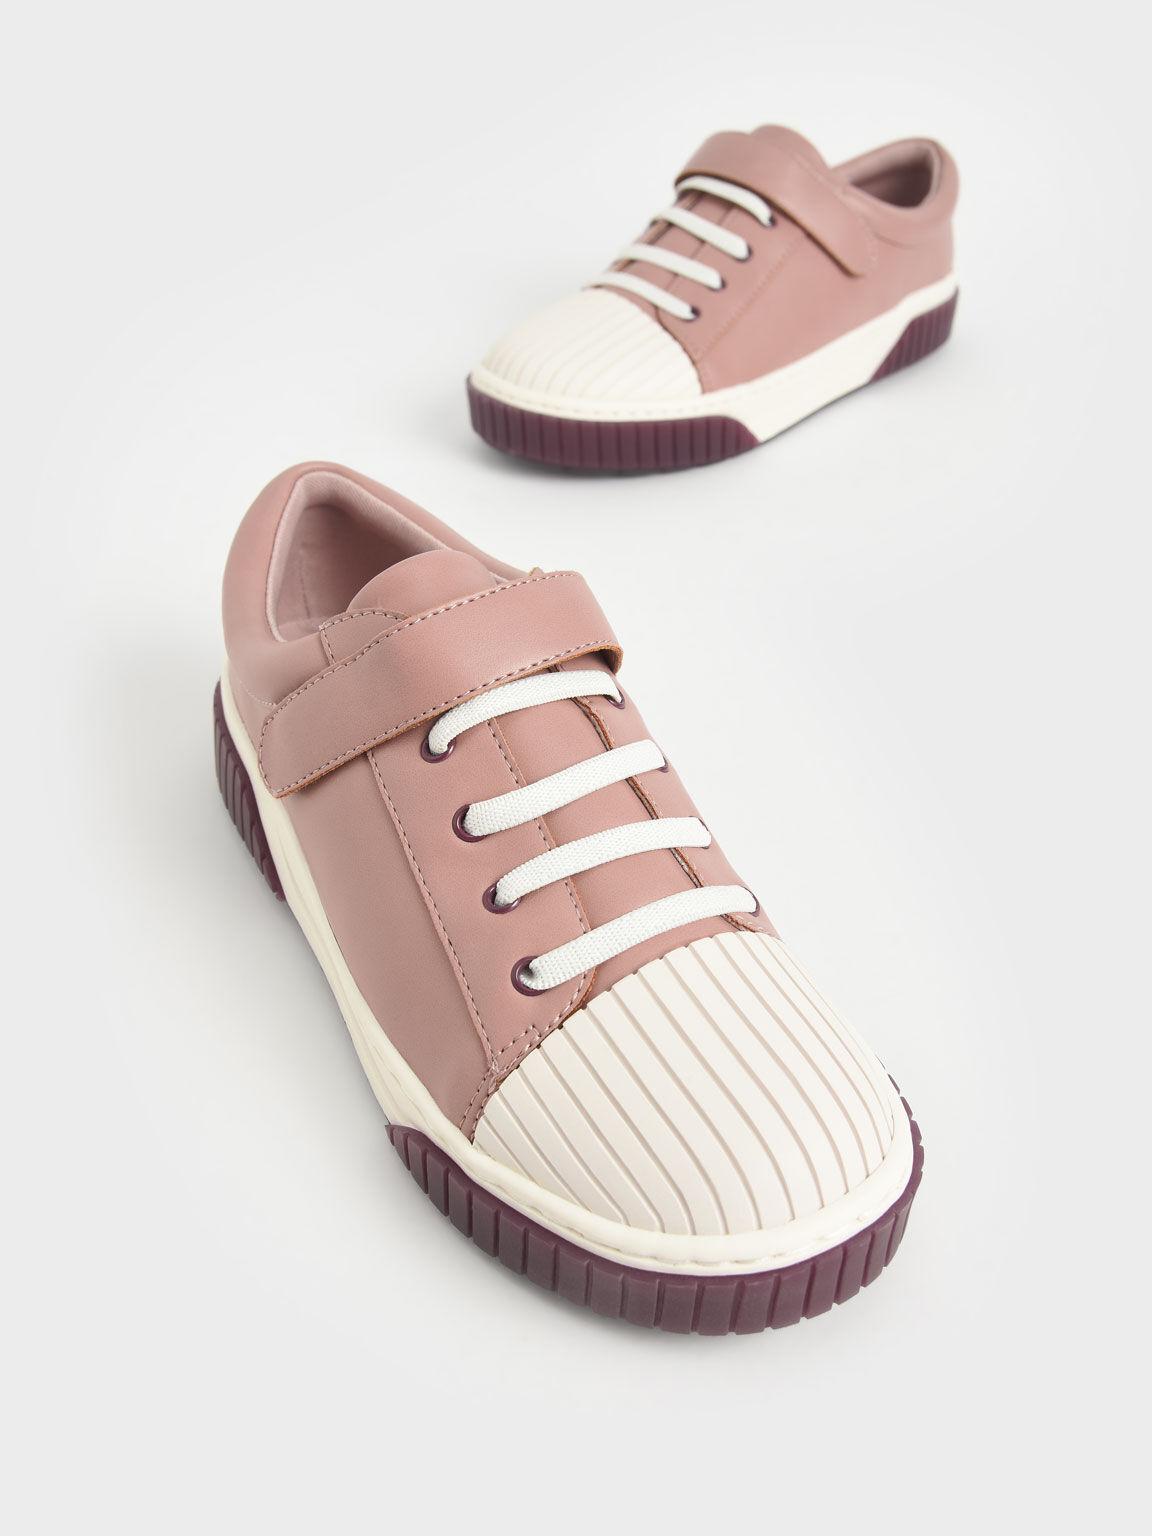 Girls' Platform Sneakers, Pink, hi-res